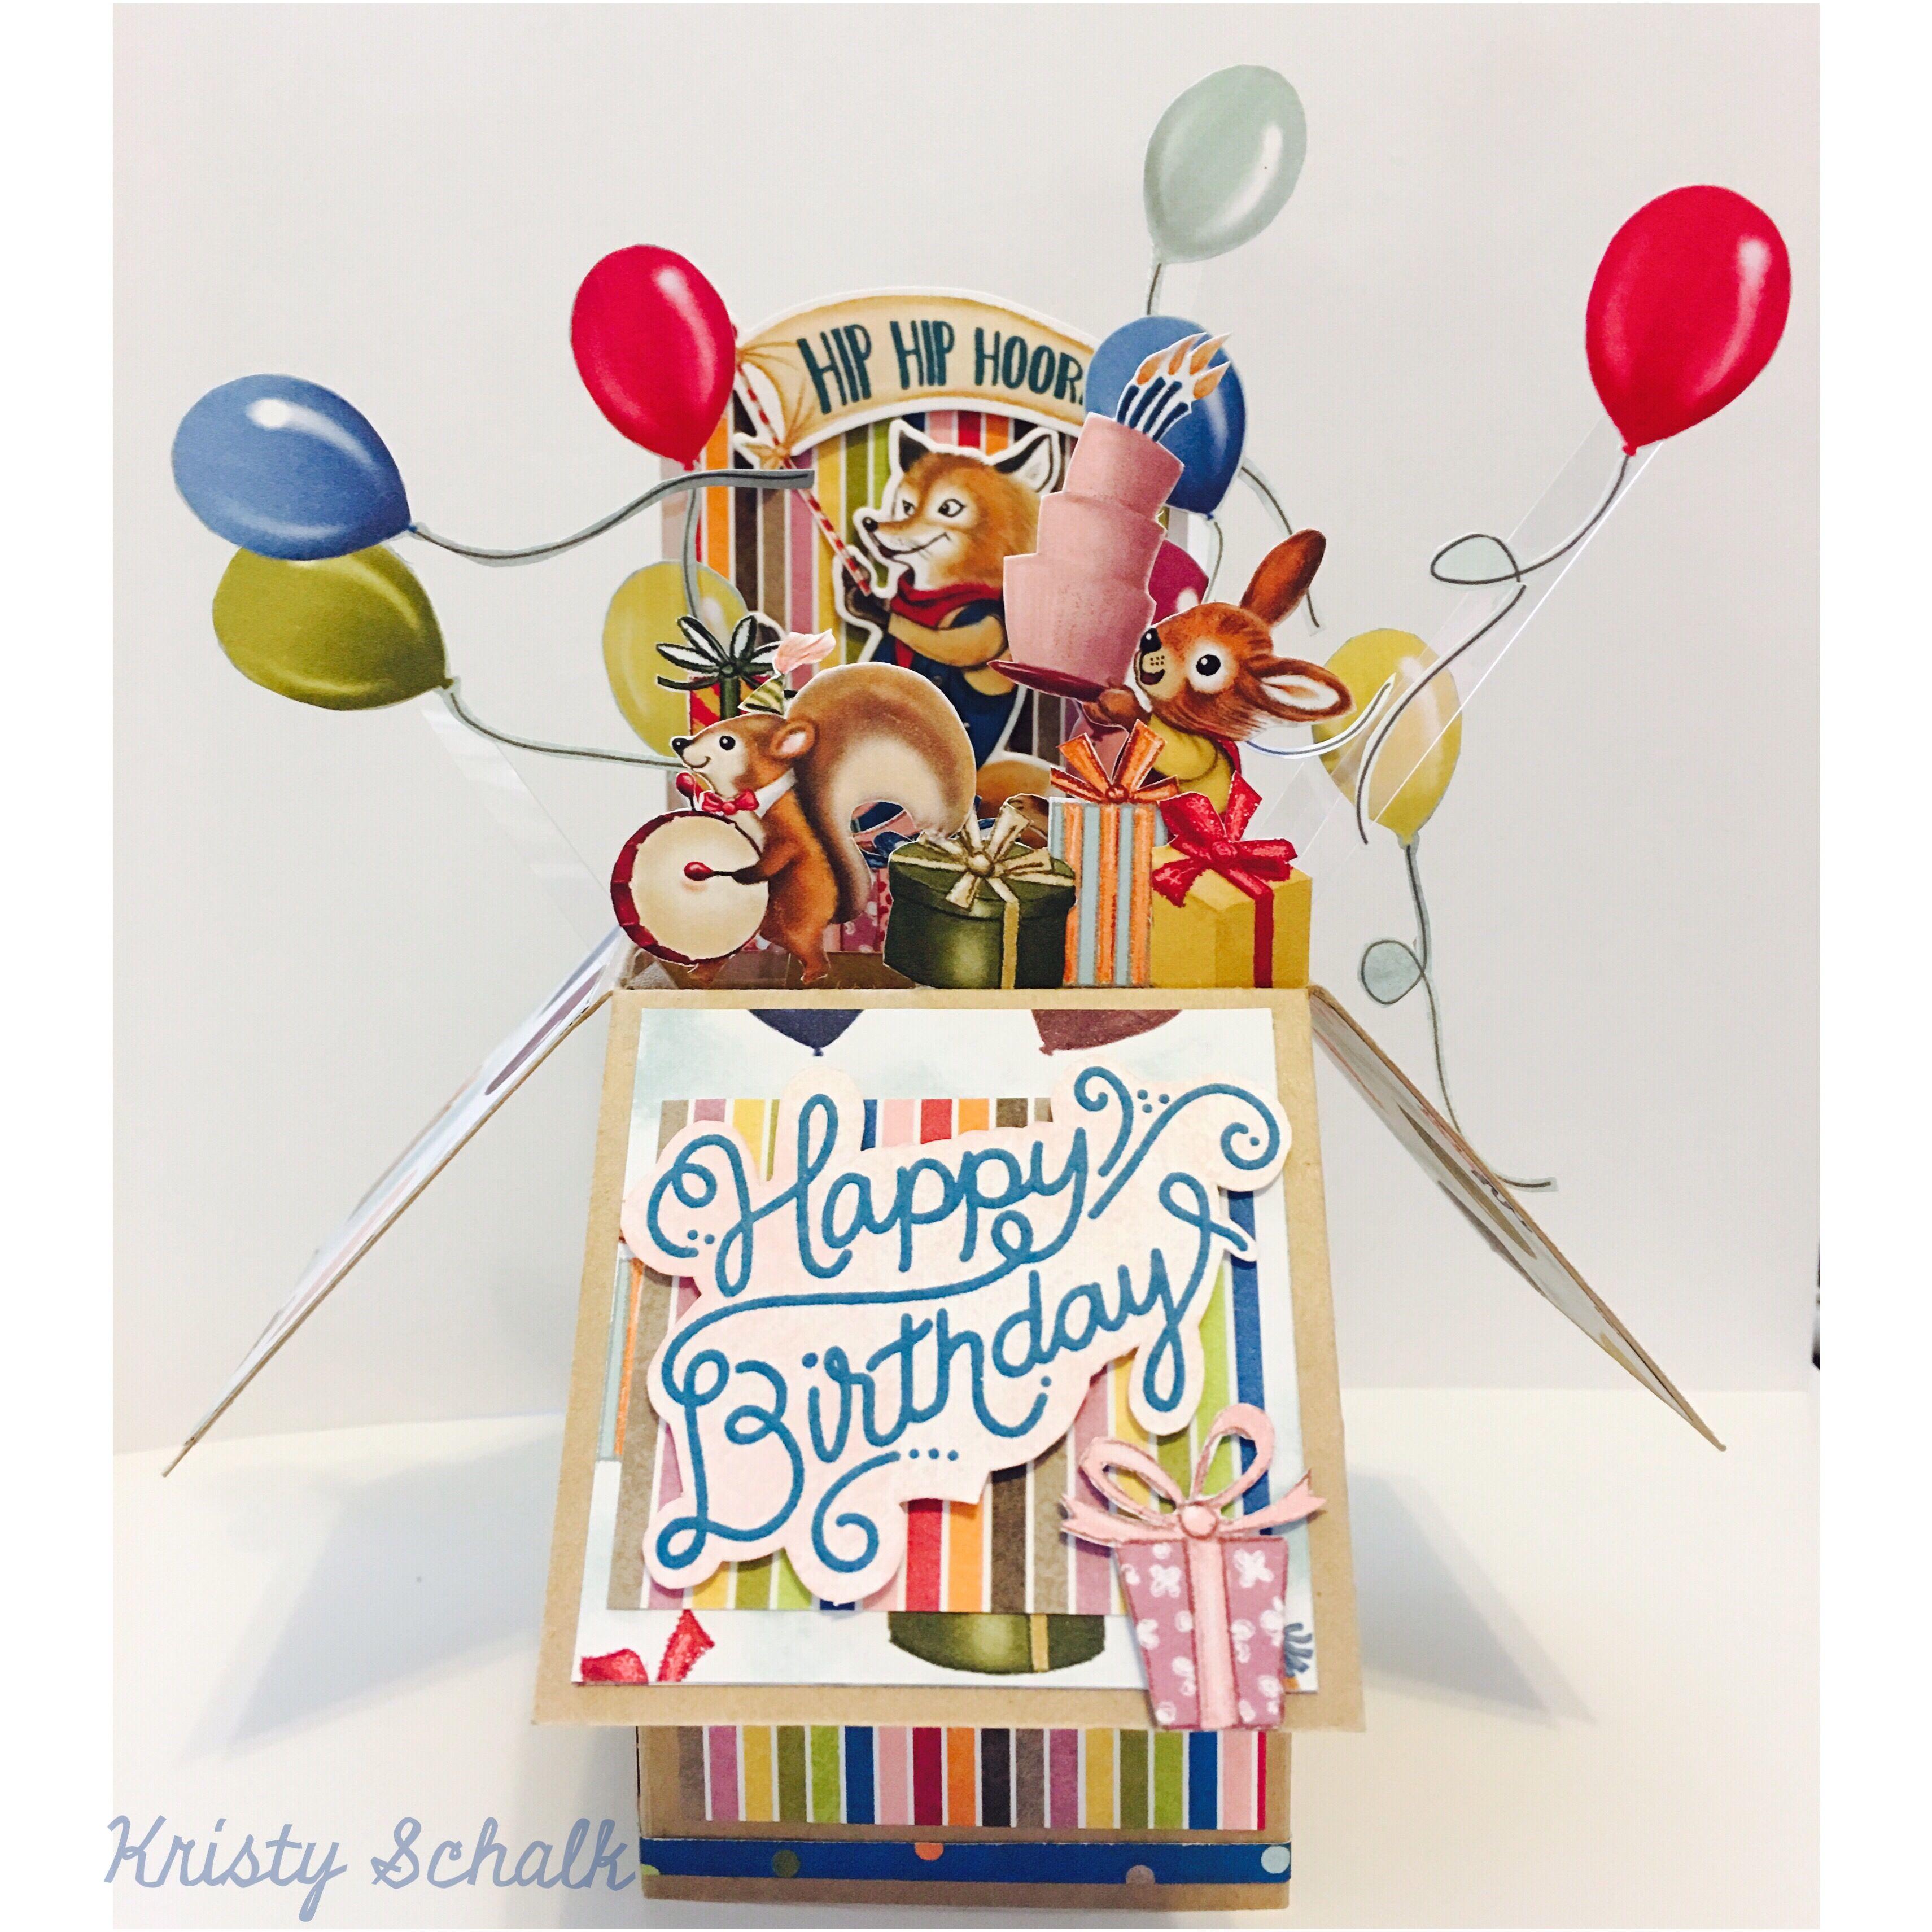 Birthday Delivery Pop Up Box Card (Stampin' Up!), birthday